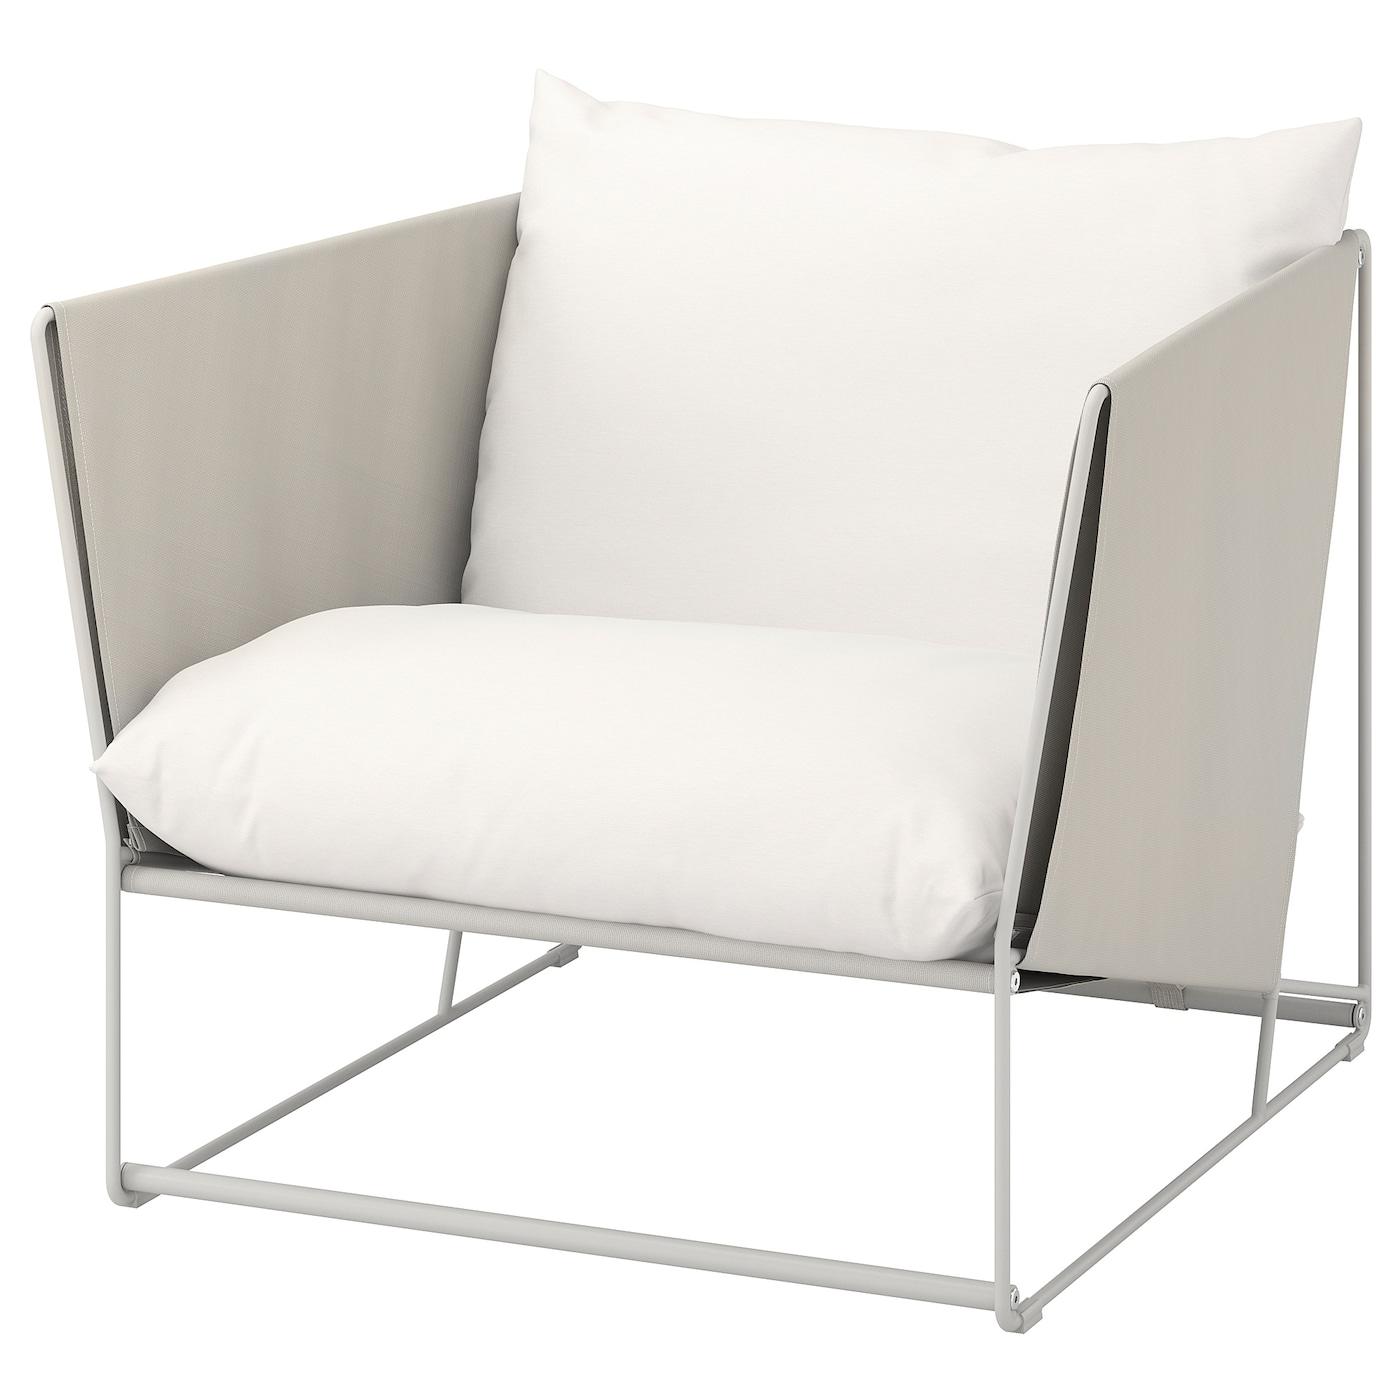 IKEA HAVSTEN Fotel, wewn/zewn, beżowy, 98x94x90 cm